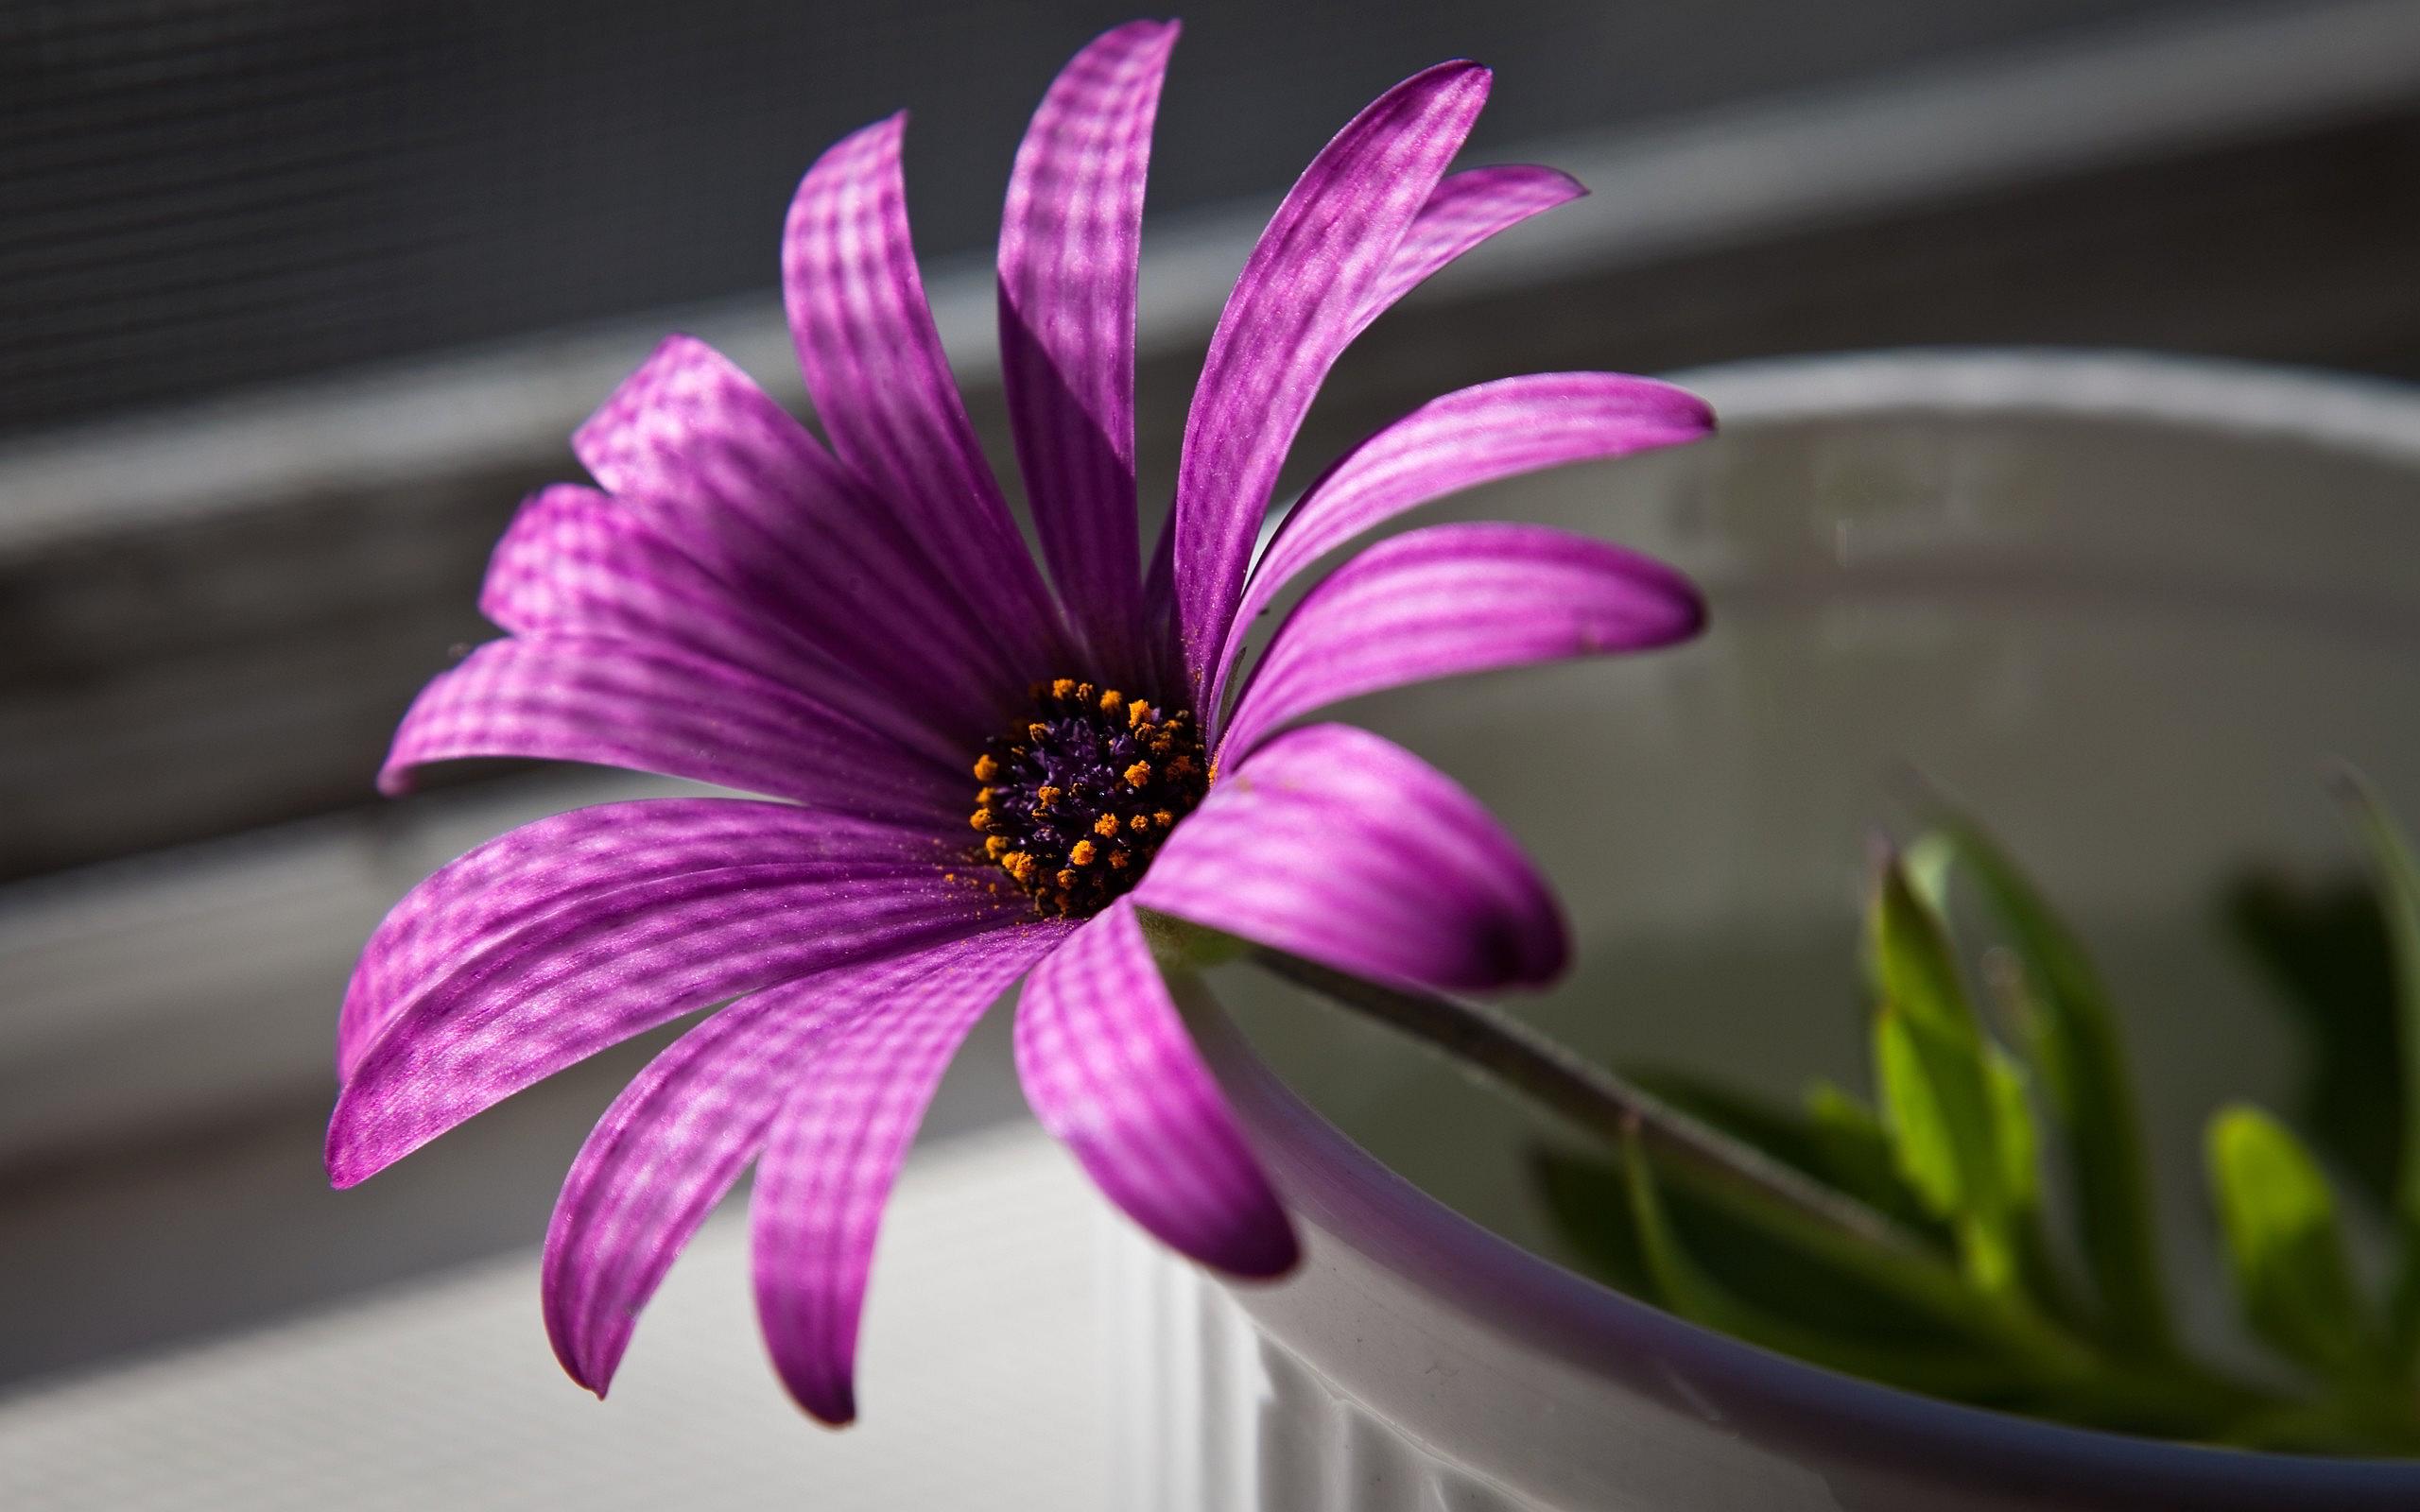 Cute Cool Wallpapers Free Purple Pink Tulips Hd Desktop Wallpapers 4k Hd